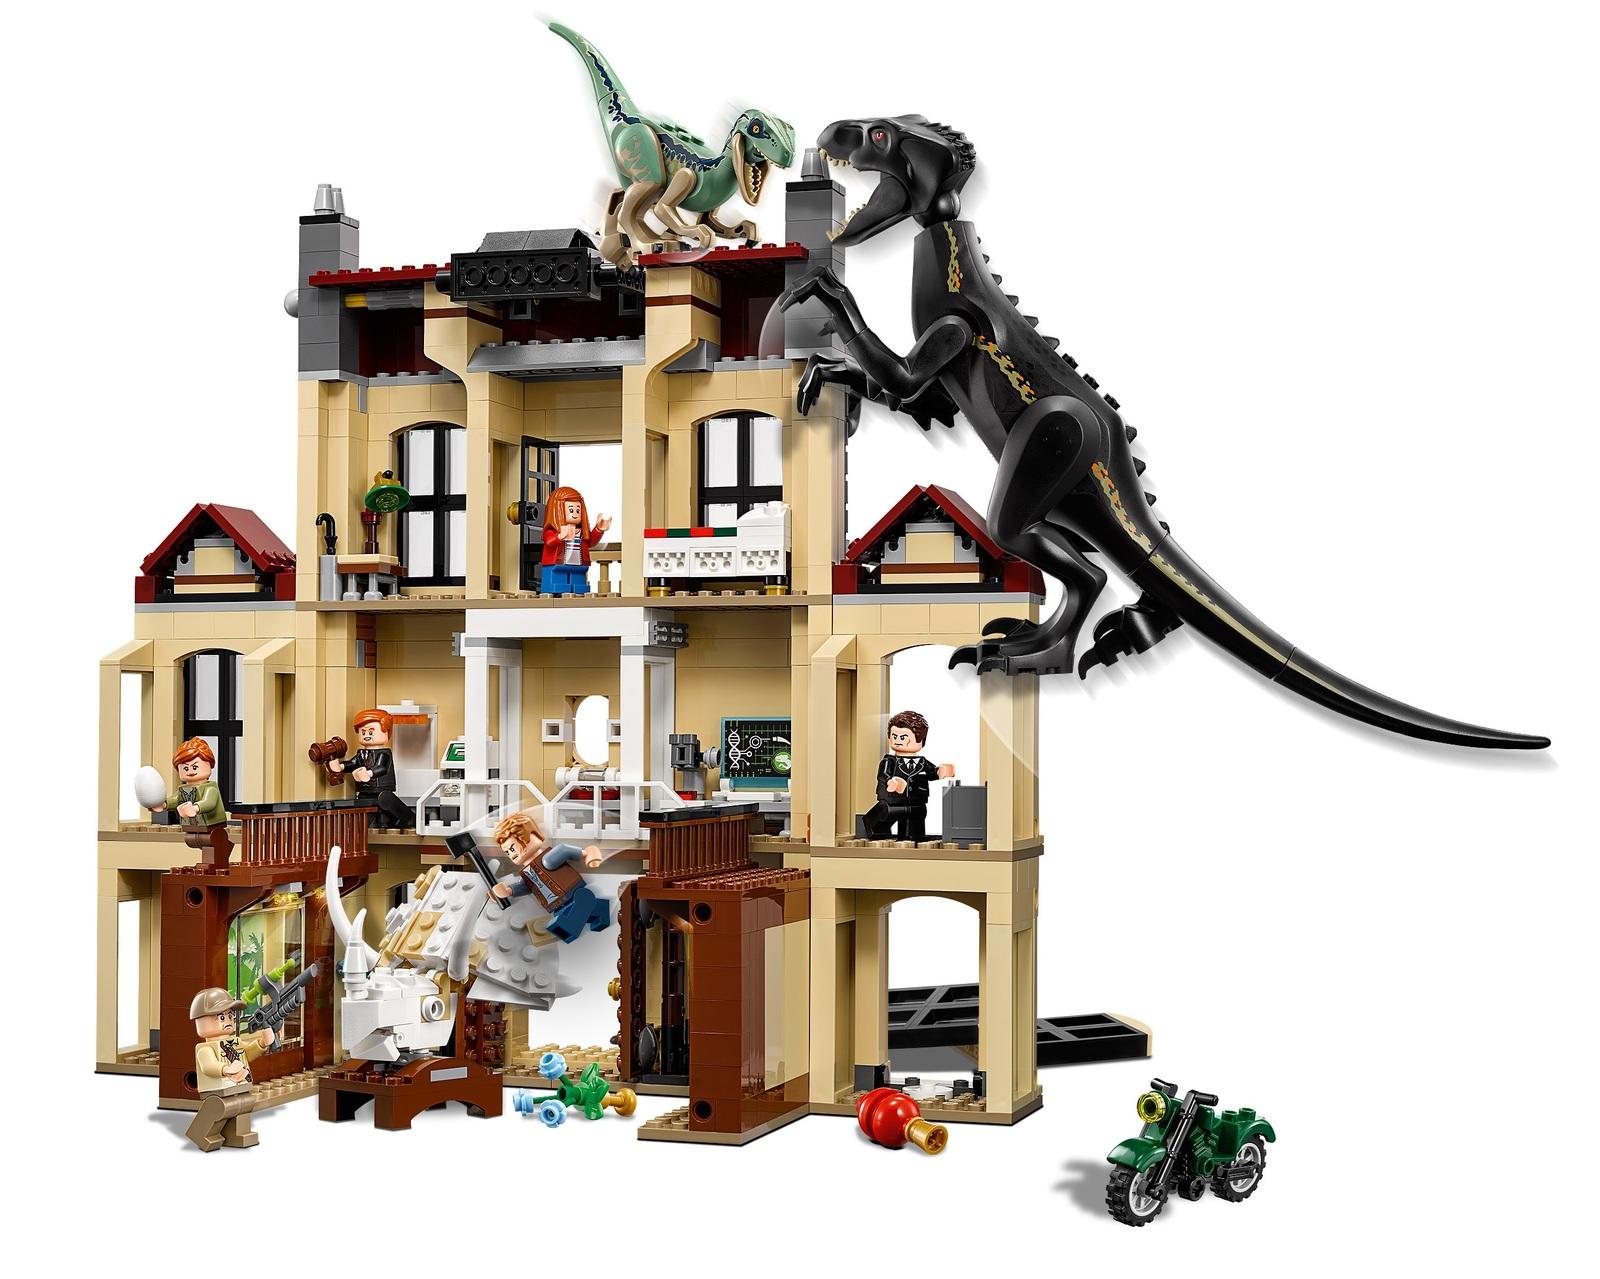 LEGO Jurassic World - Indoraptor Rampage at Lockwood Estate (75930) image